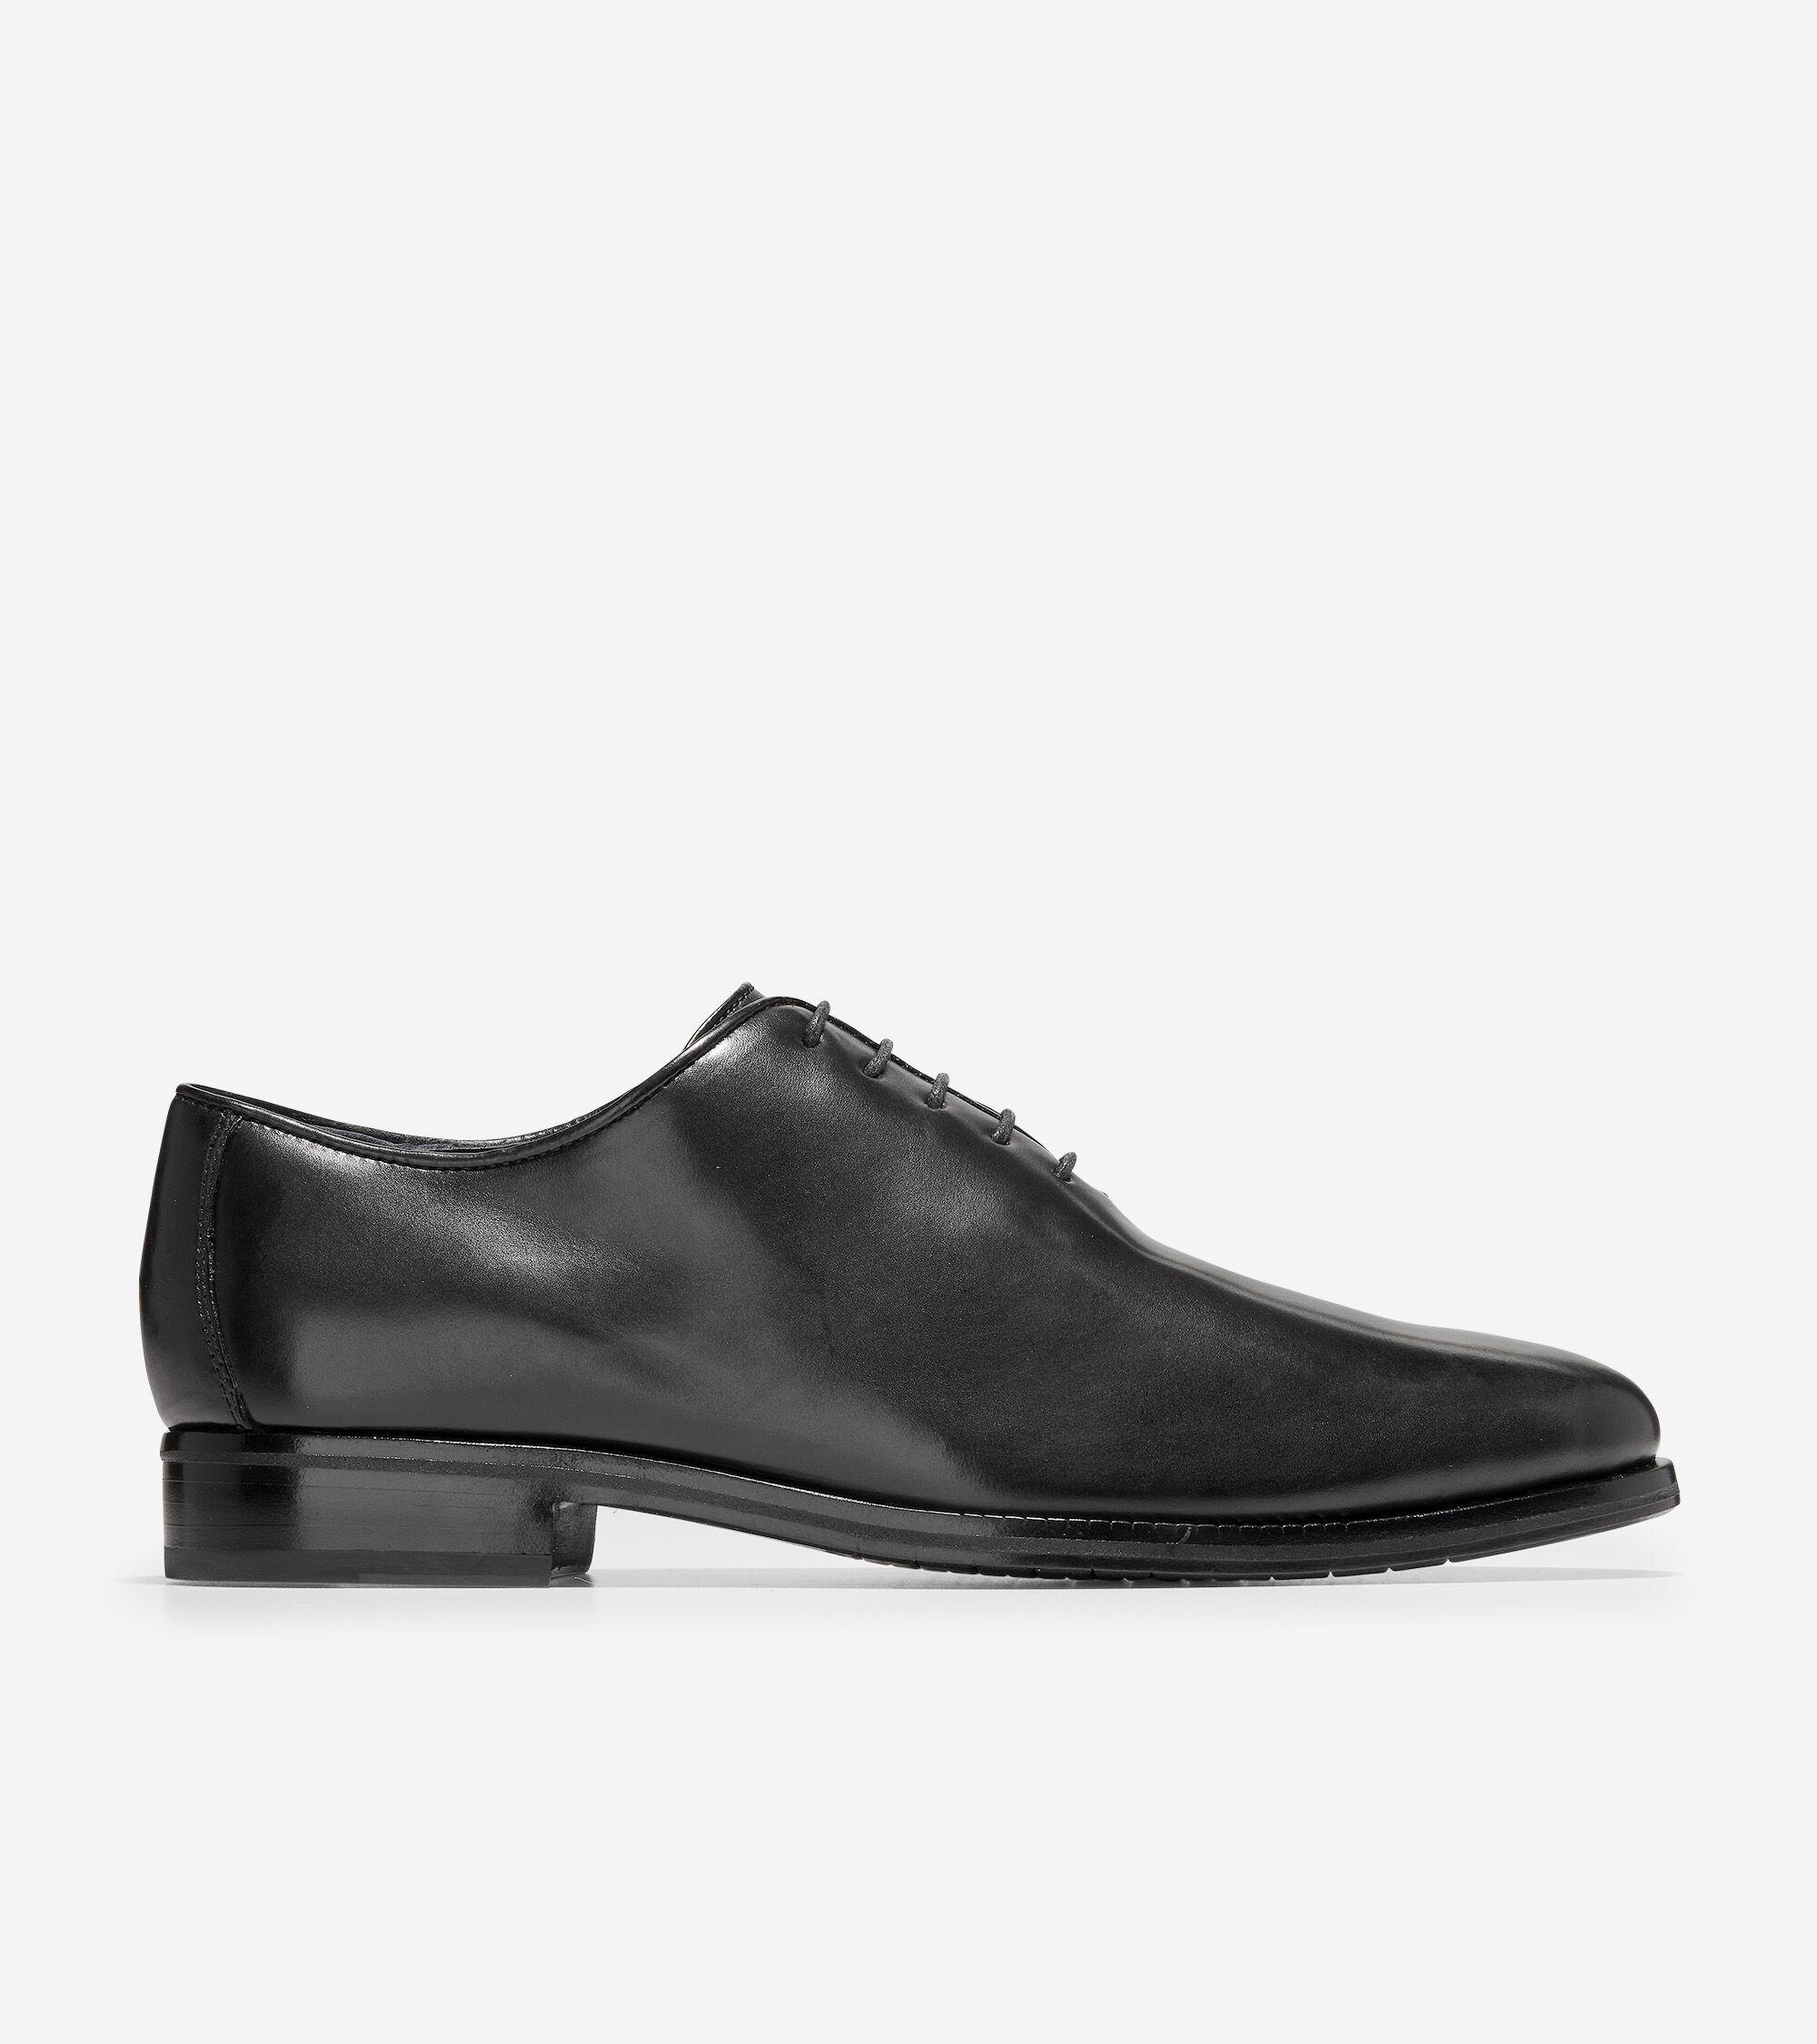 Cole haan black leather gloves - Washington Grand Wholecut Oxford